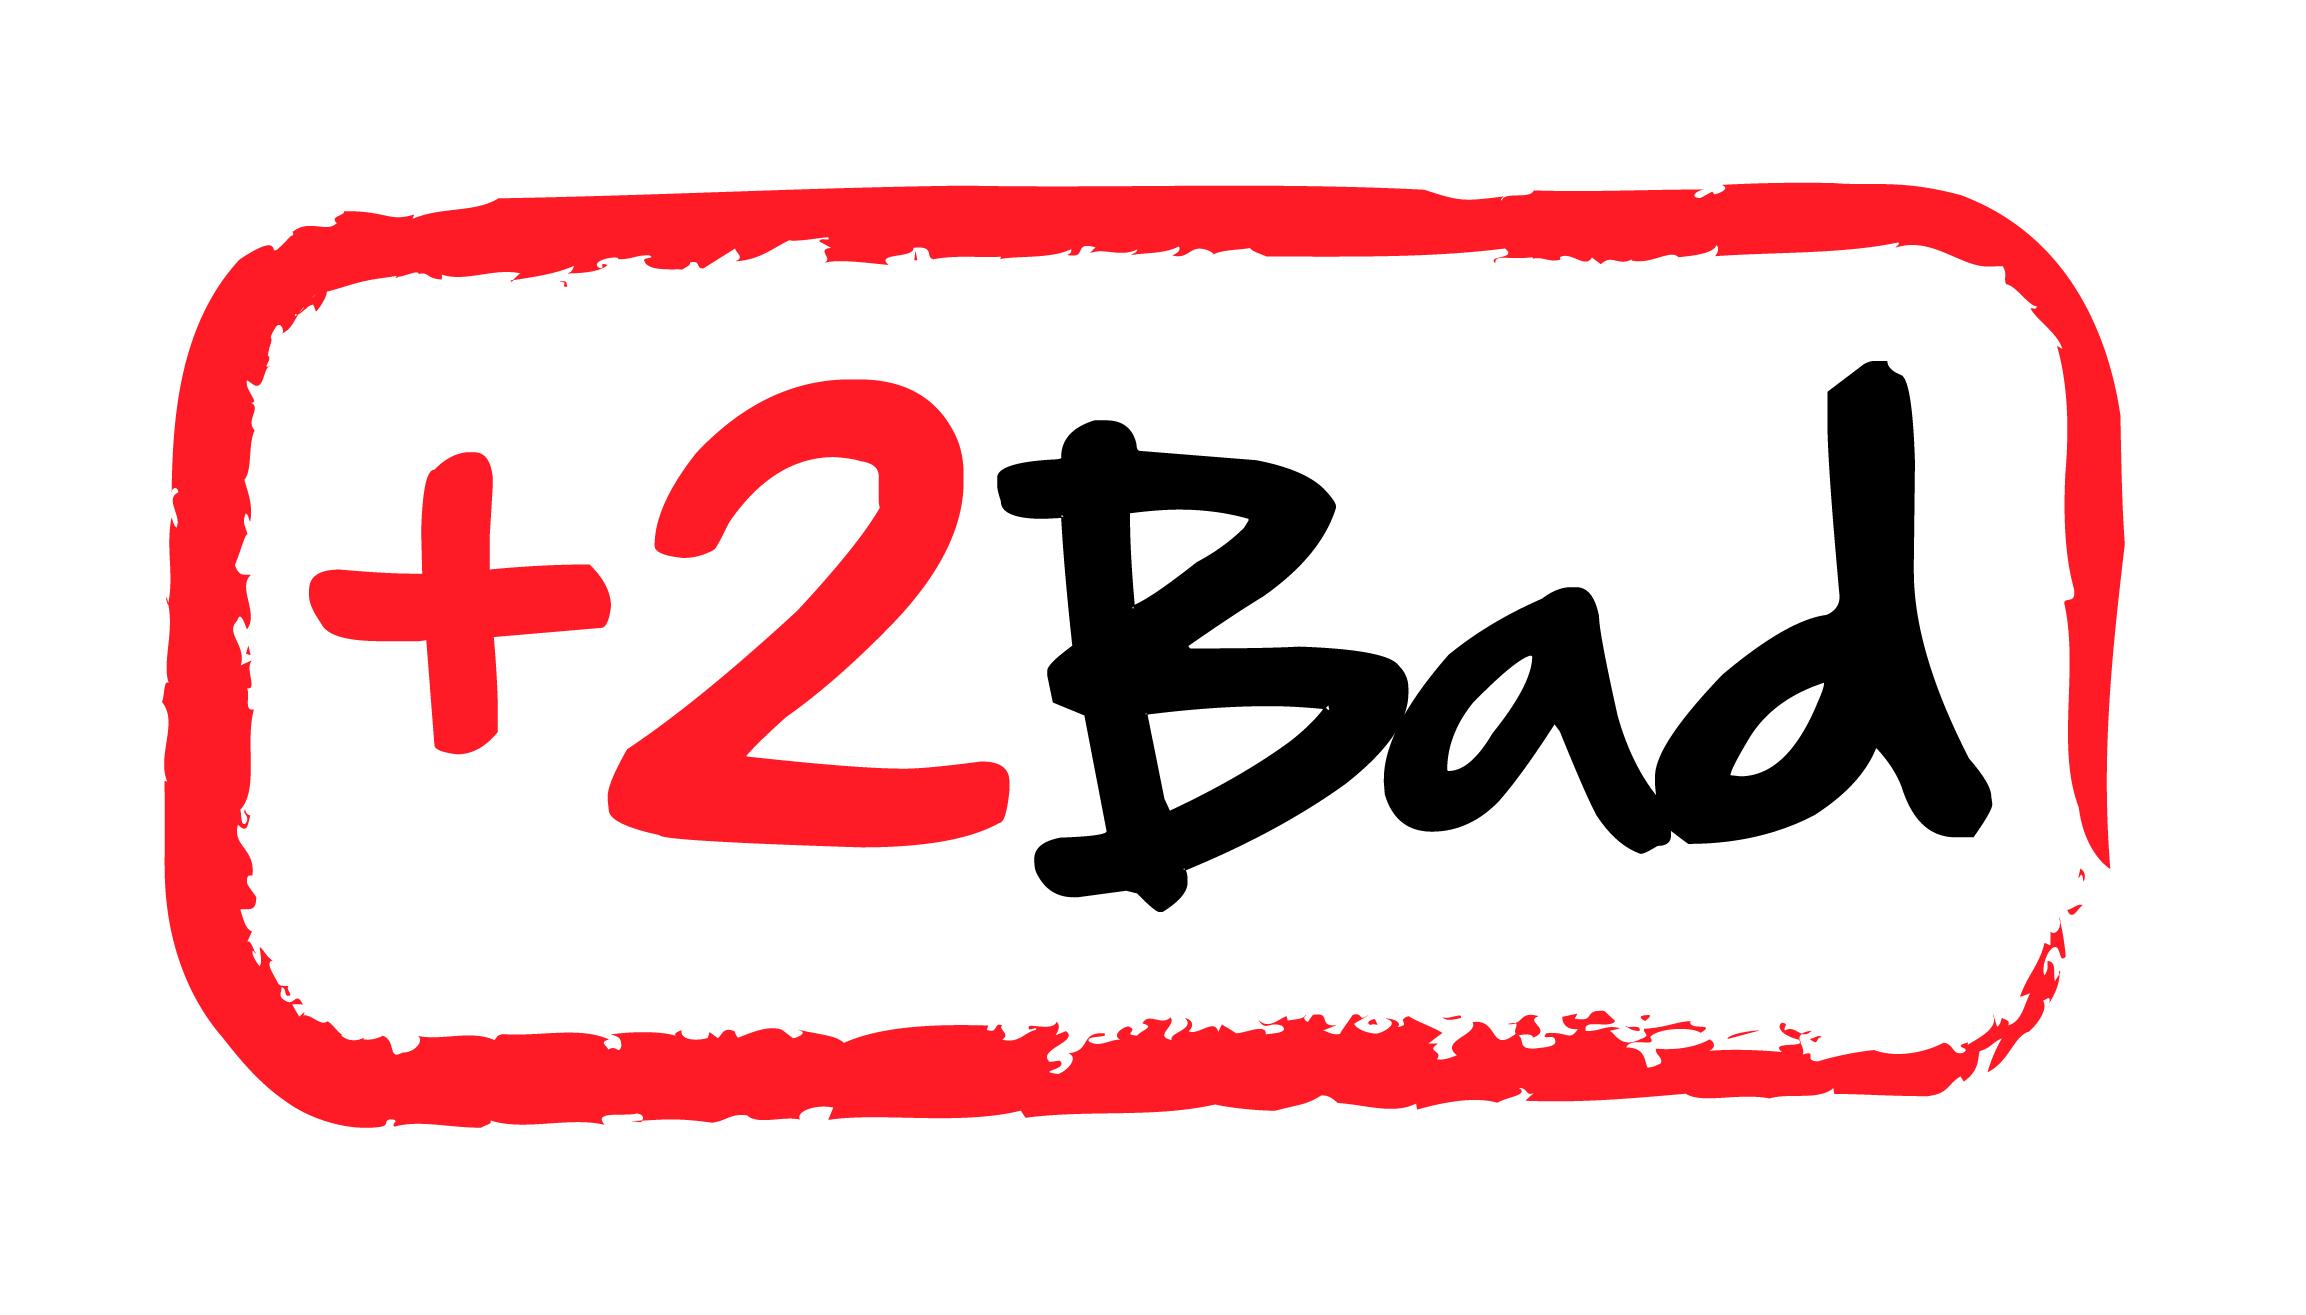 Logo_+2bad